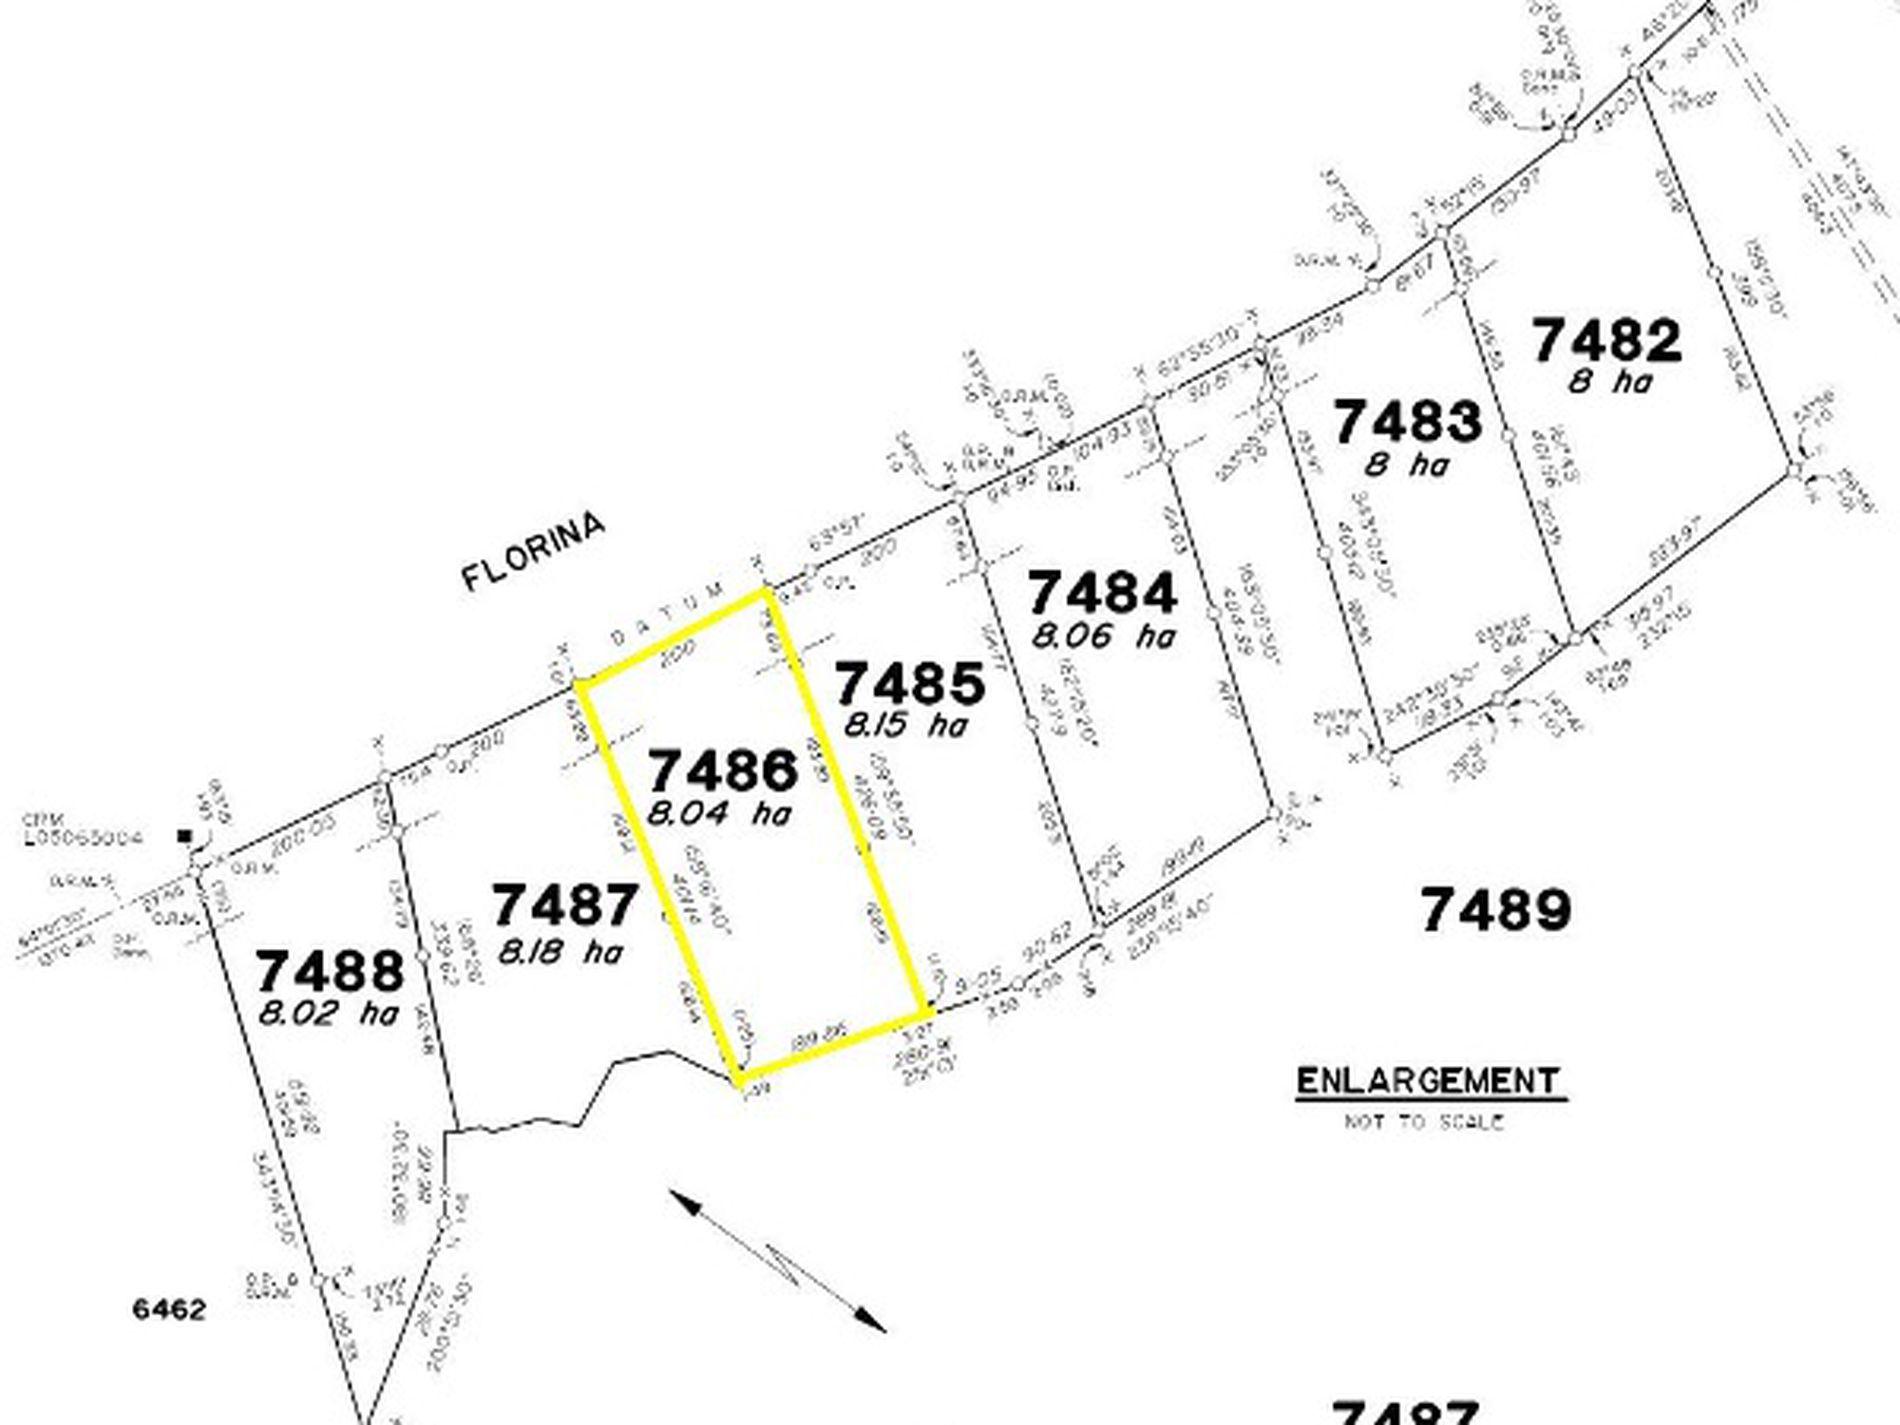 1801 Florina Road, Katherine